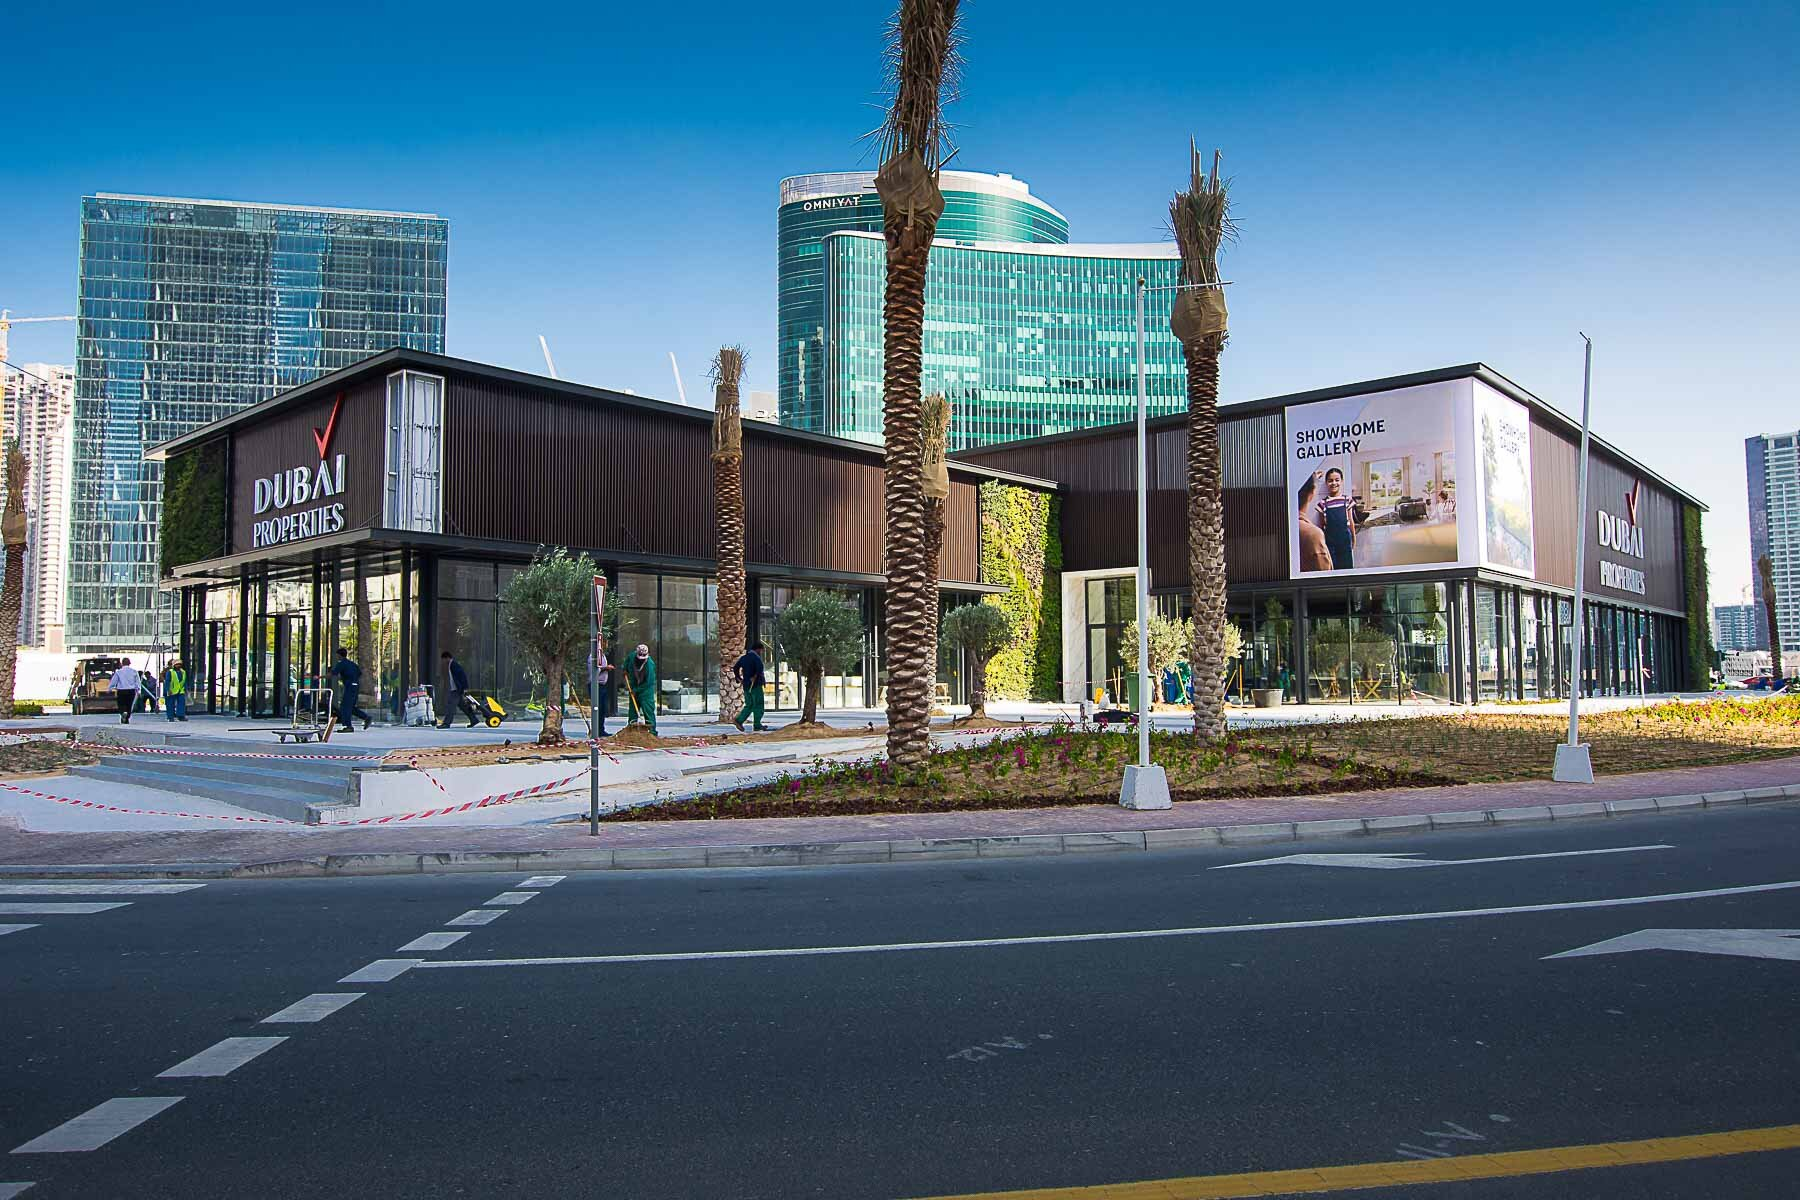 Biel_Group_Dubai_Properties_High_Cube_Temporary_Structure_Tent_2018-1074.jpg